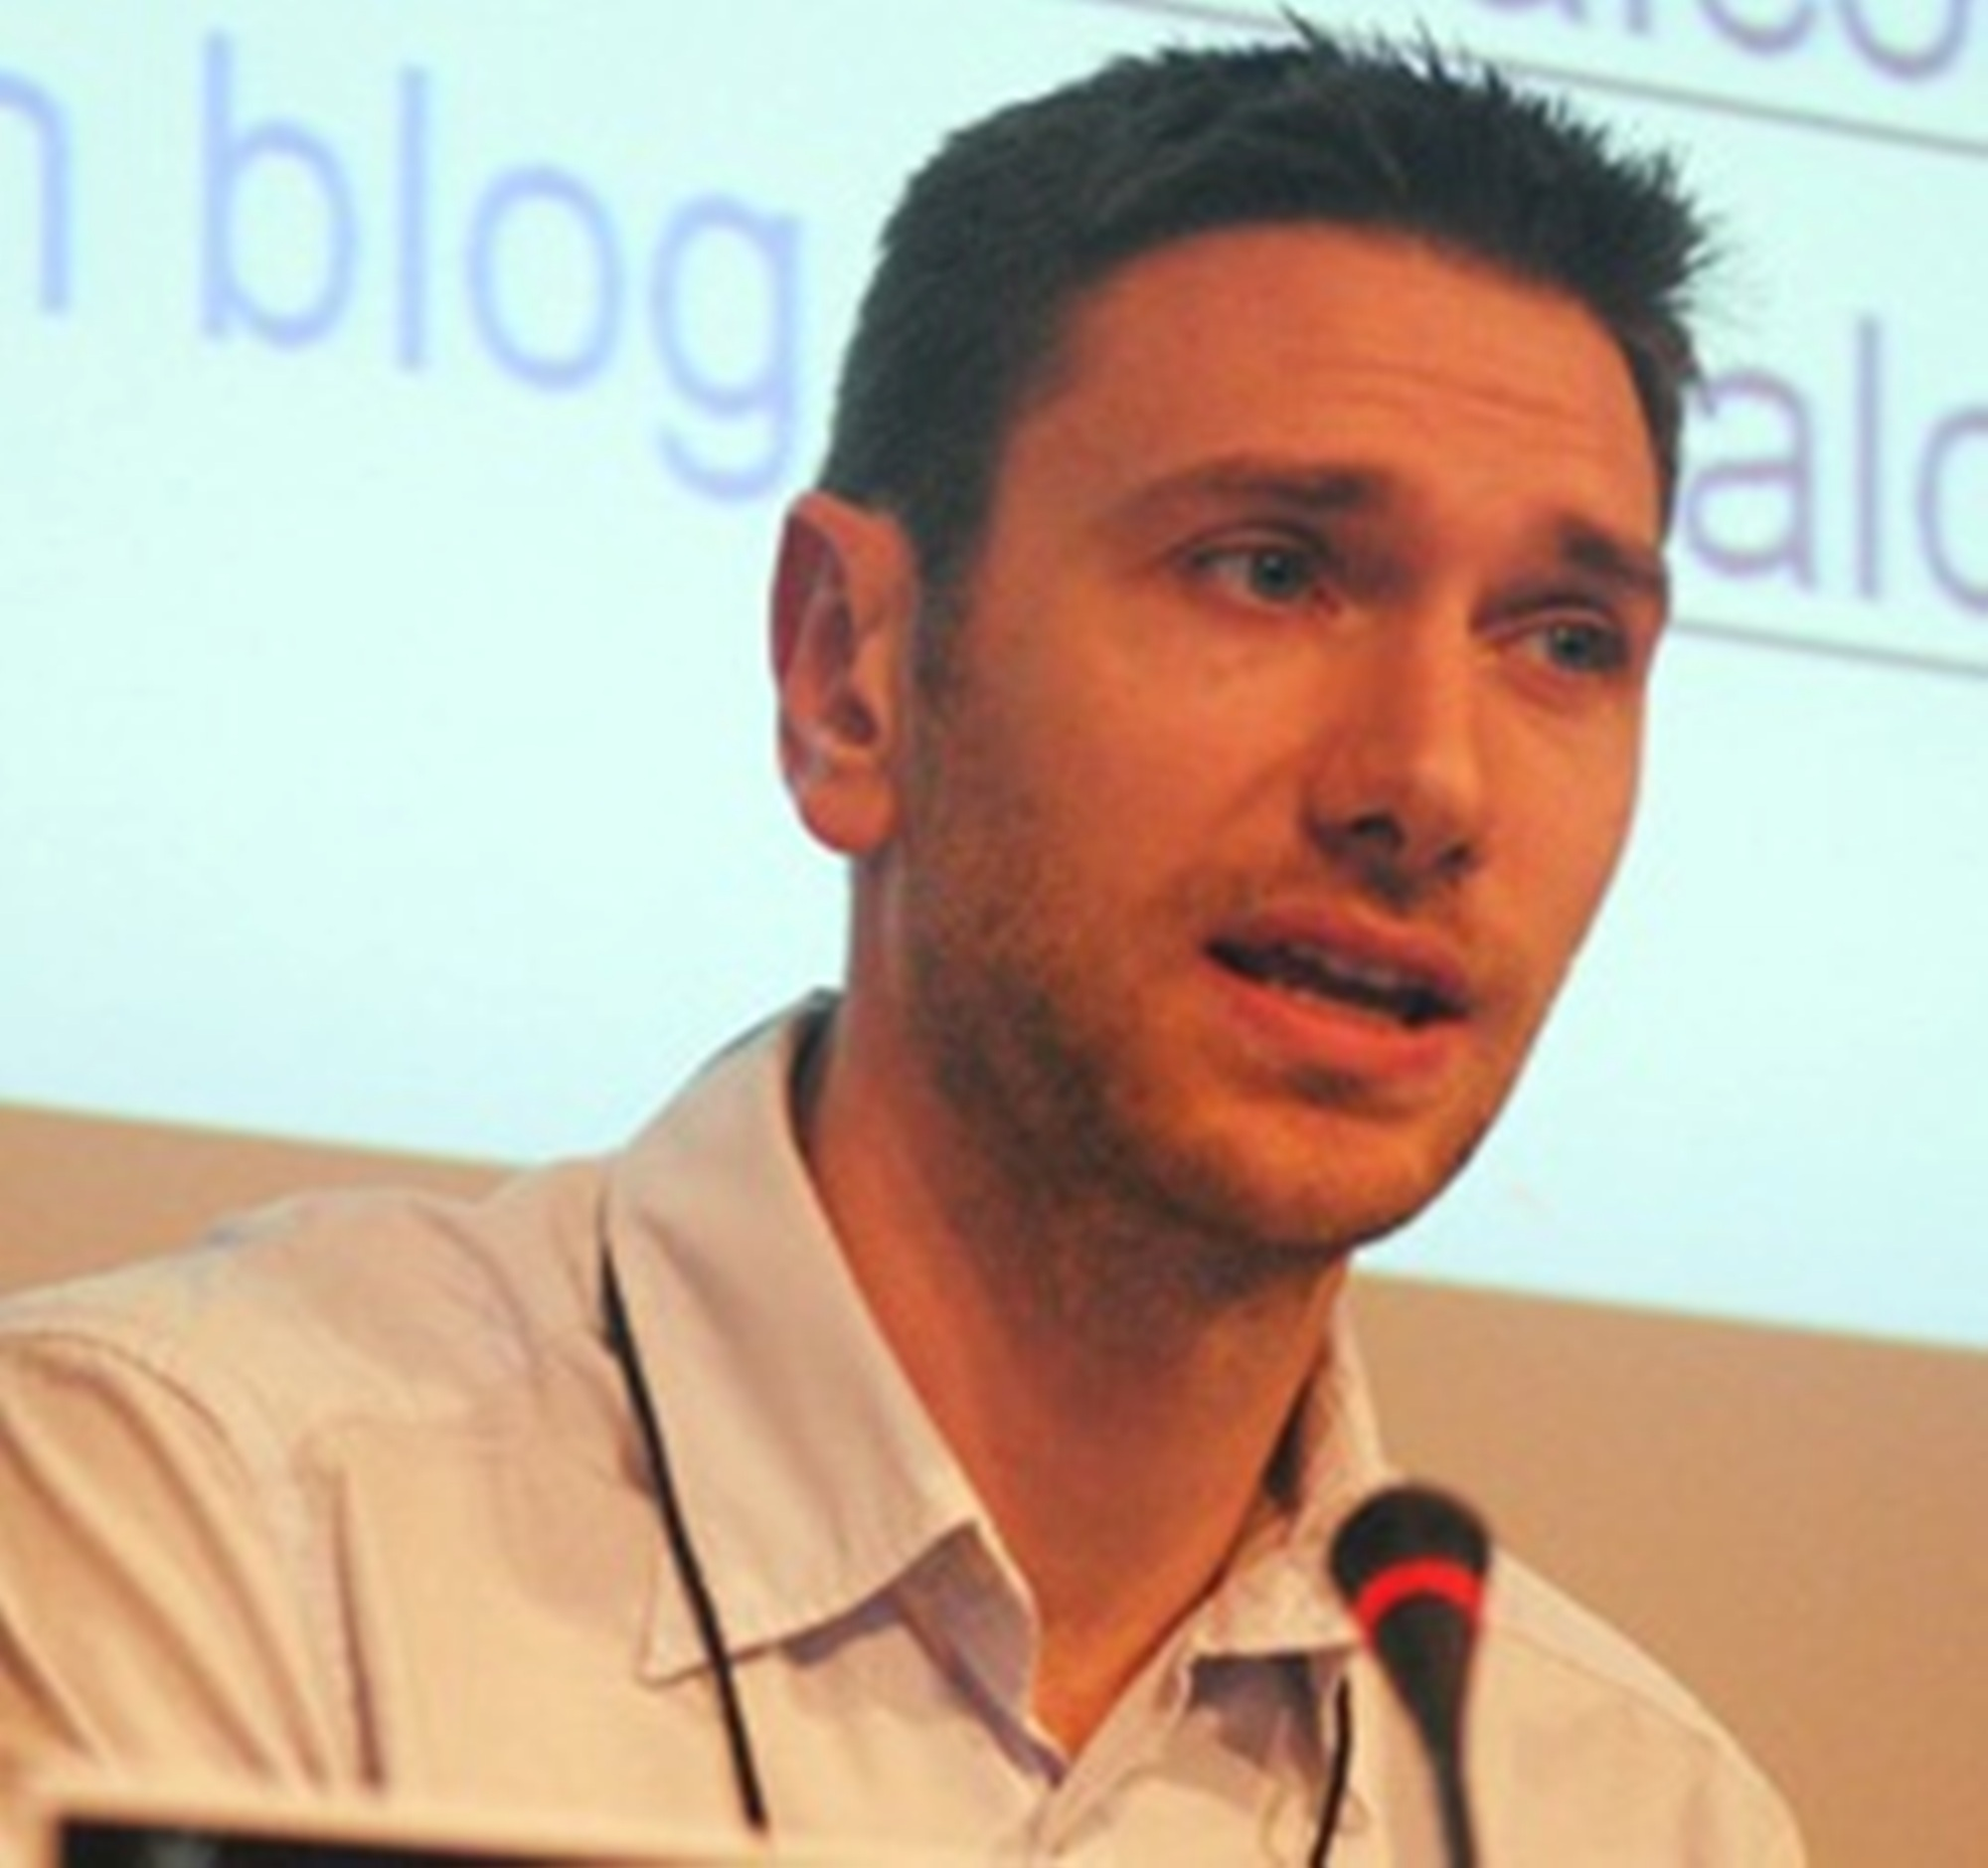 James Morris, Editor, Alcohol Policy UK